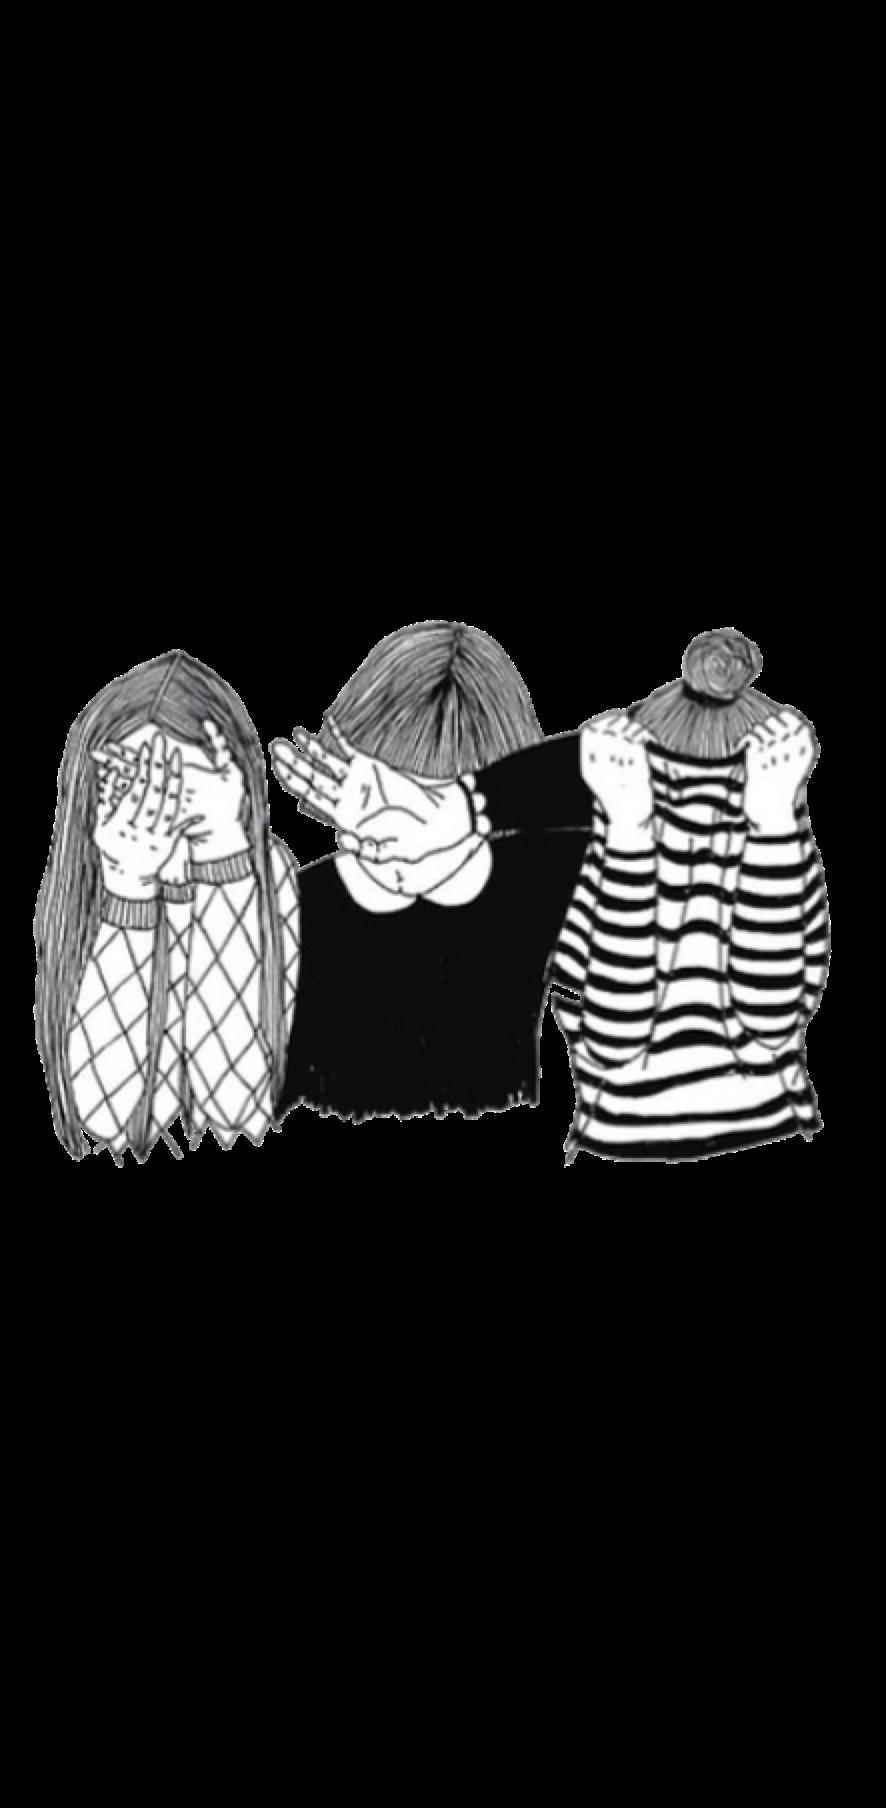 cover 3 girls